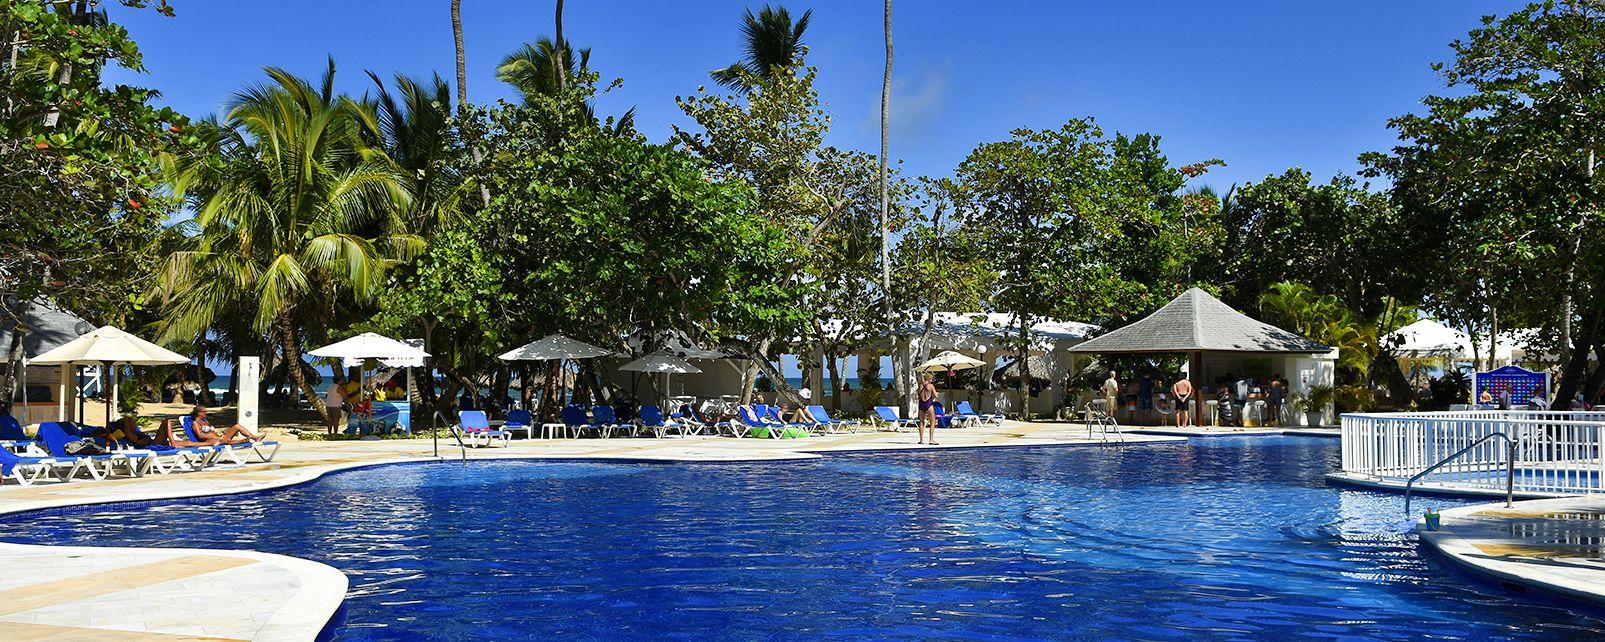 Hotel Grand Bahia Principe El Portillo